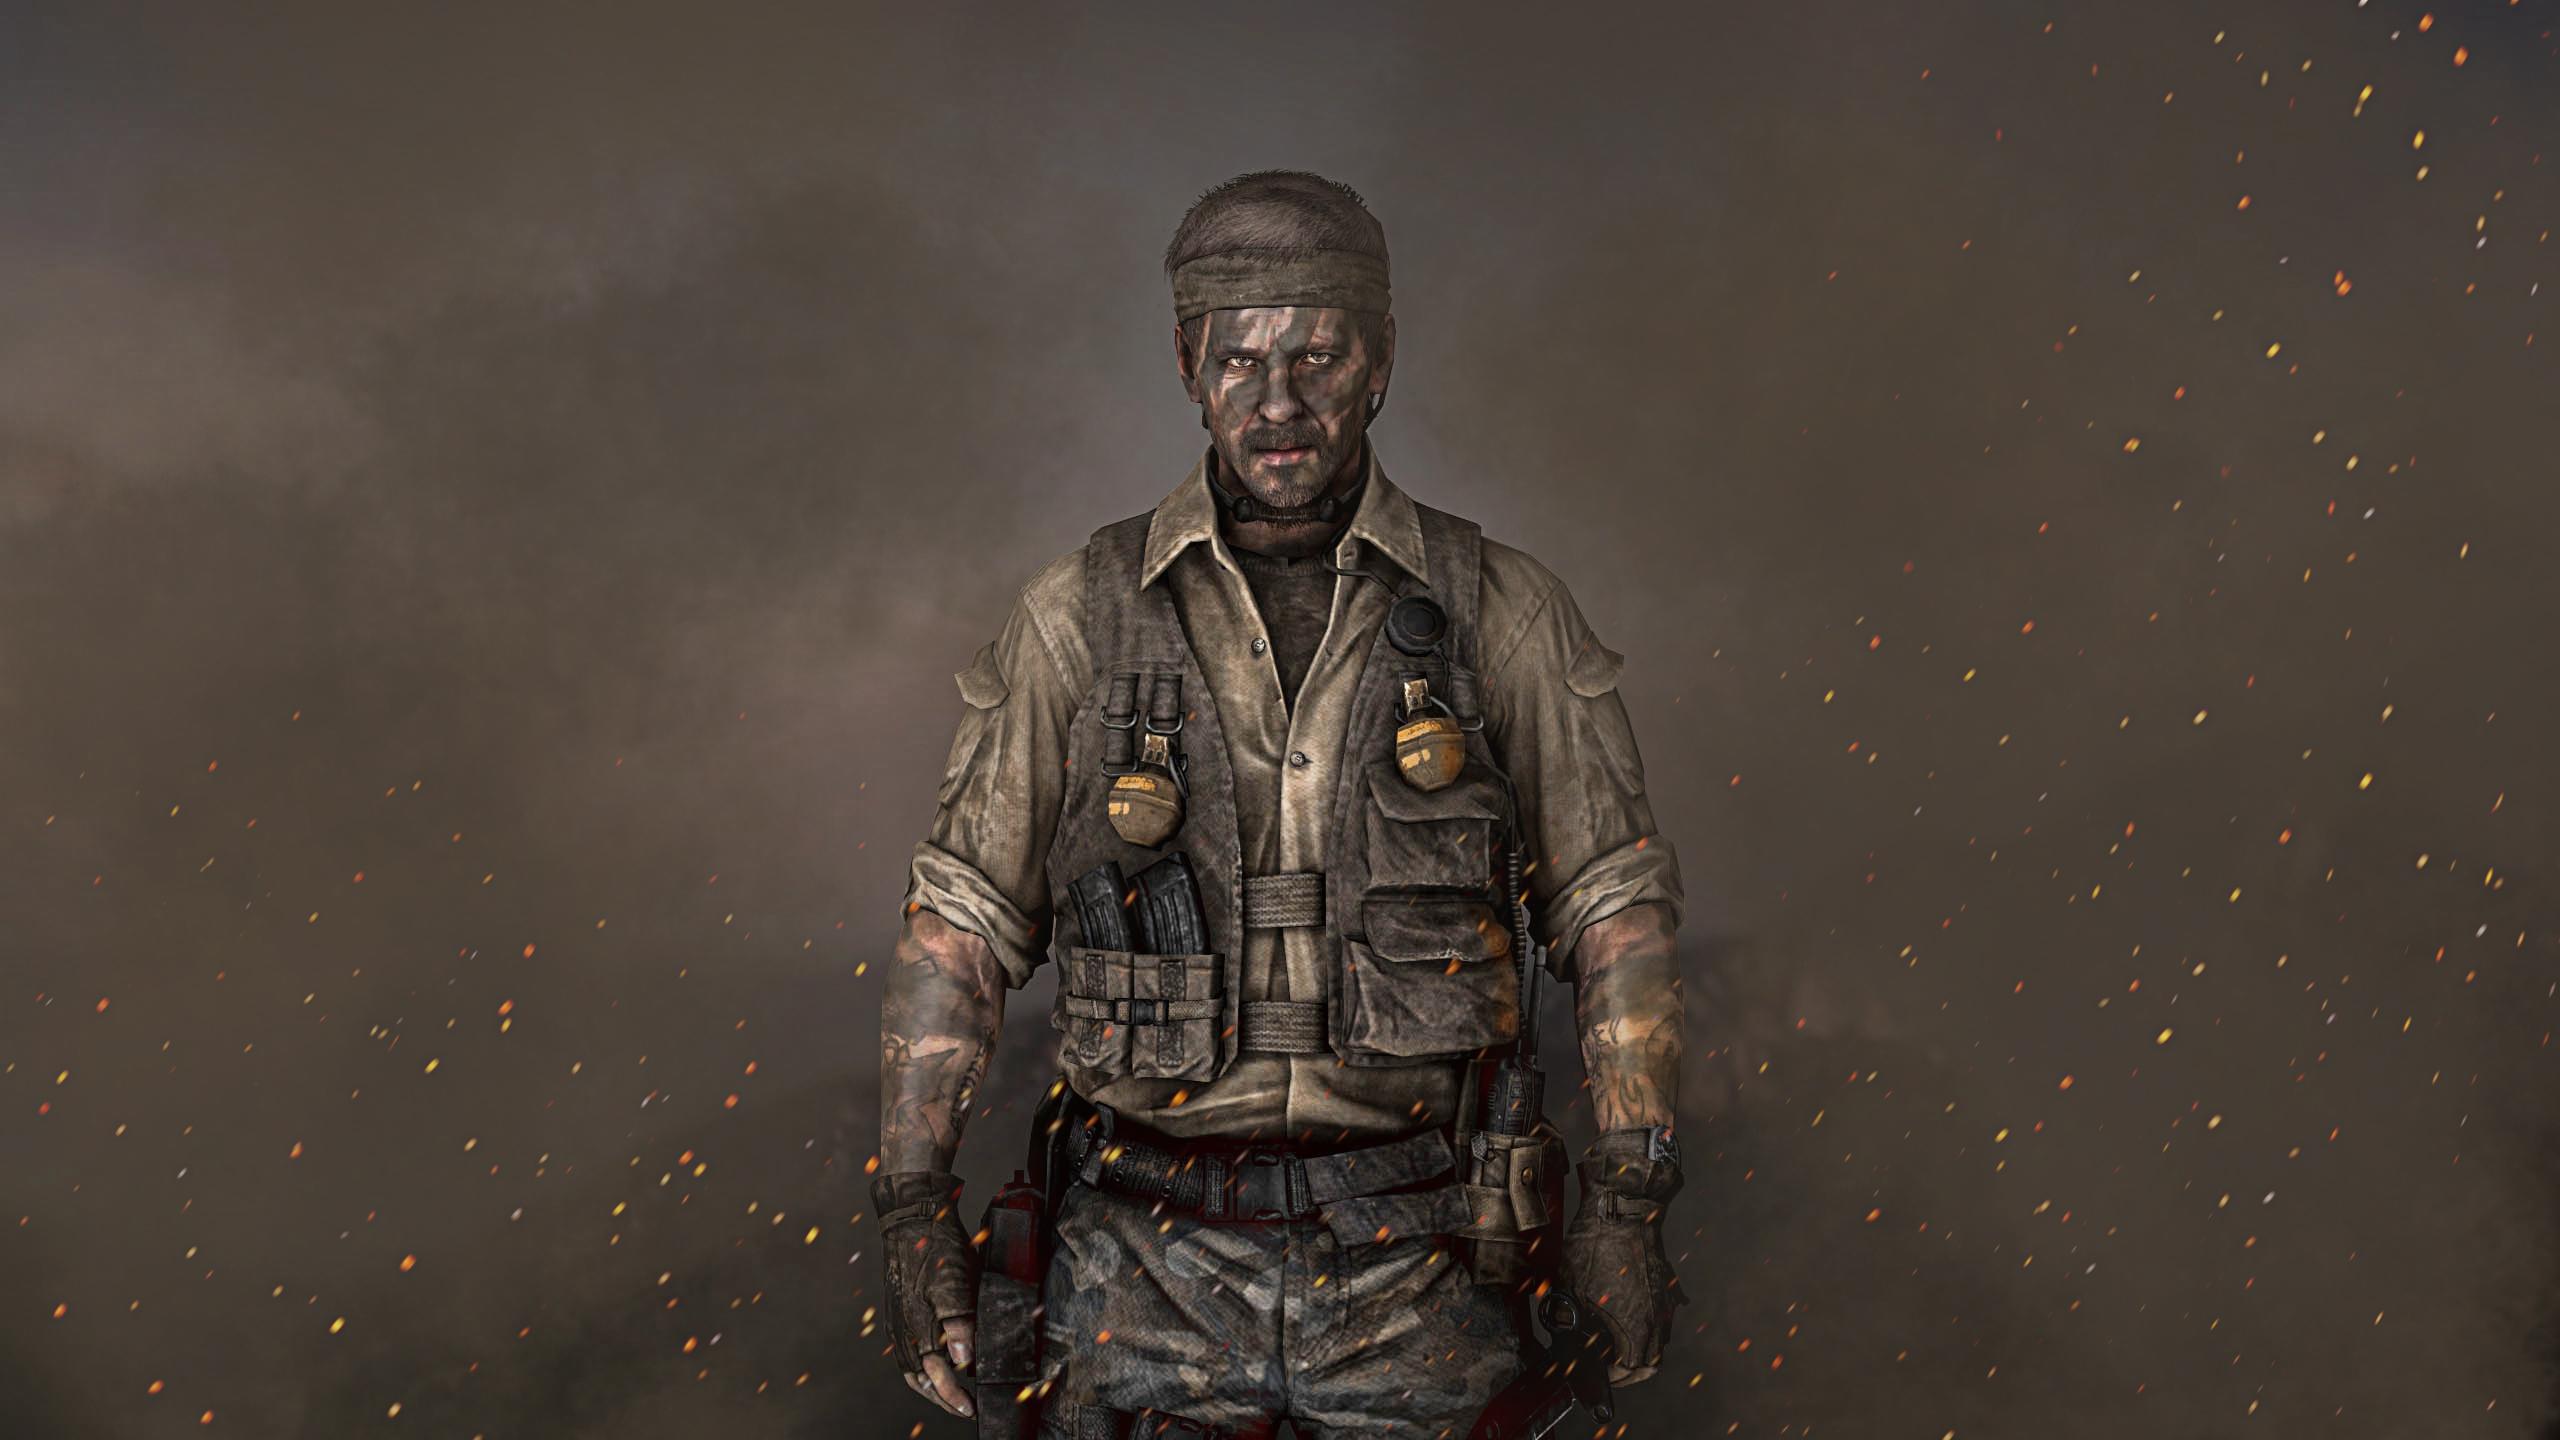 Call Of Duty Black Ops 2 Wallpaper By Romahen On Deviantart